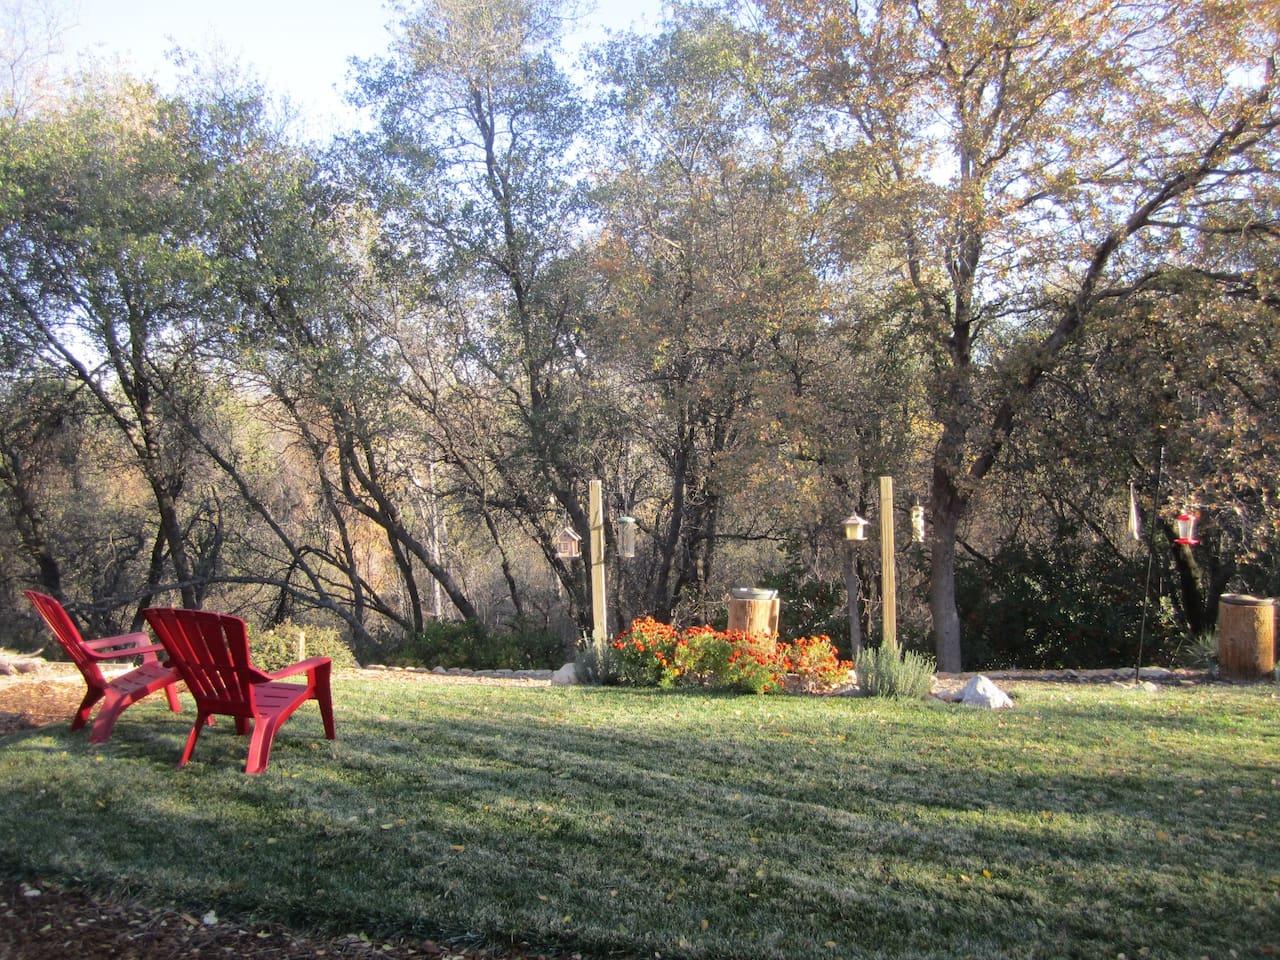 Our Peaceful Backyard!